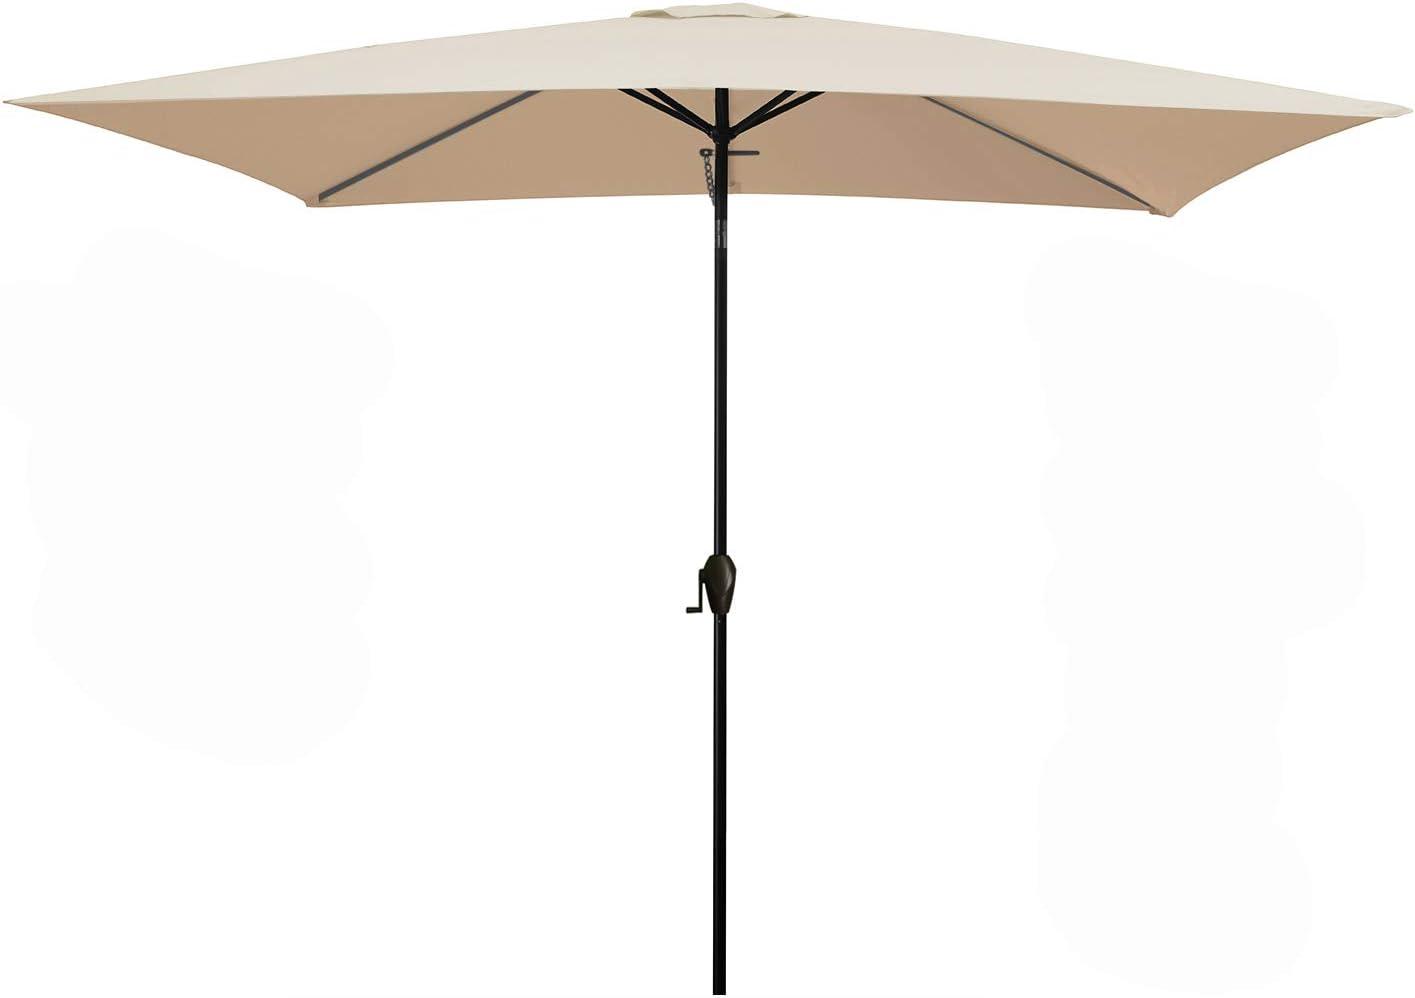 MEWAY Rectangular Patio Table Umbrella Garden Umbrella with Tilt and Crank for Commercial Event Market, Garden, Deck,Backyard,Pool and Patio Table (6.6 * 10 ft, Beige)